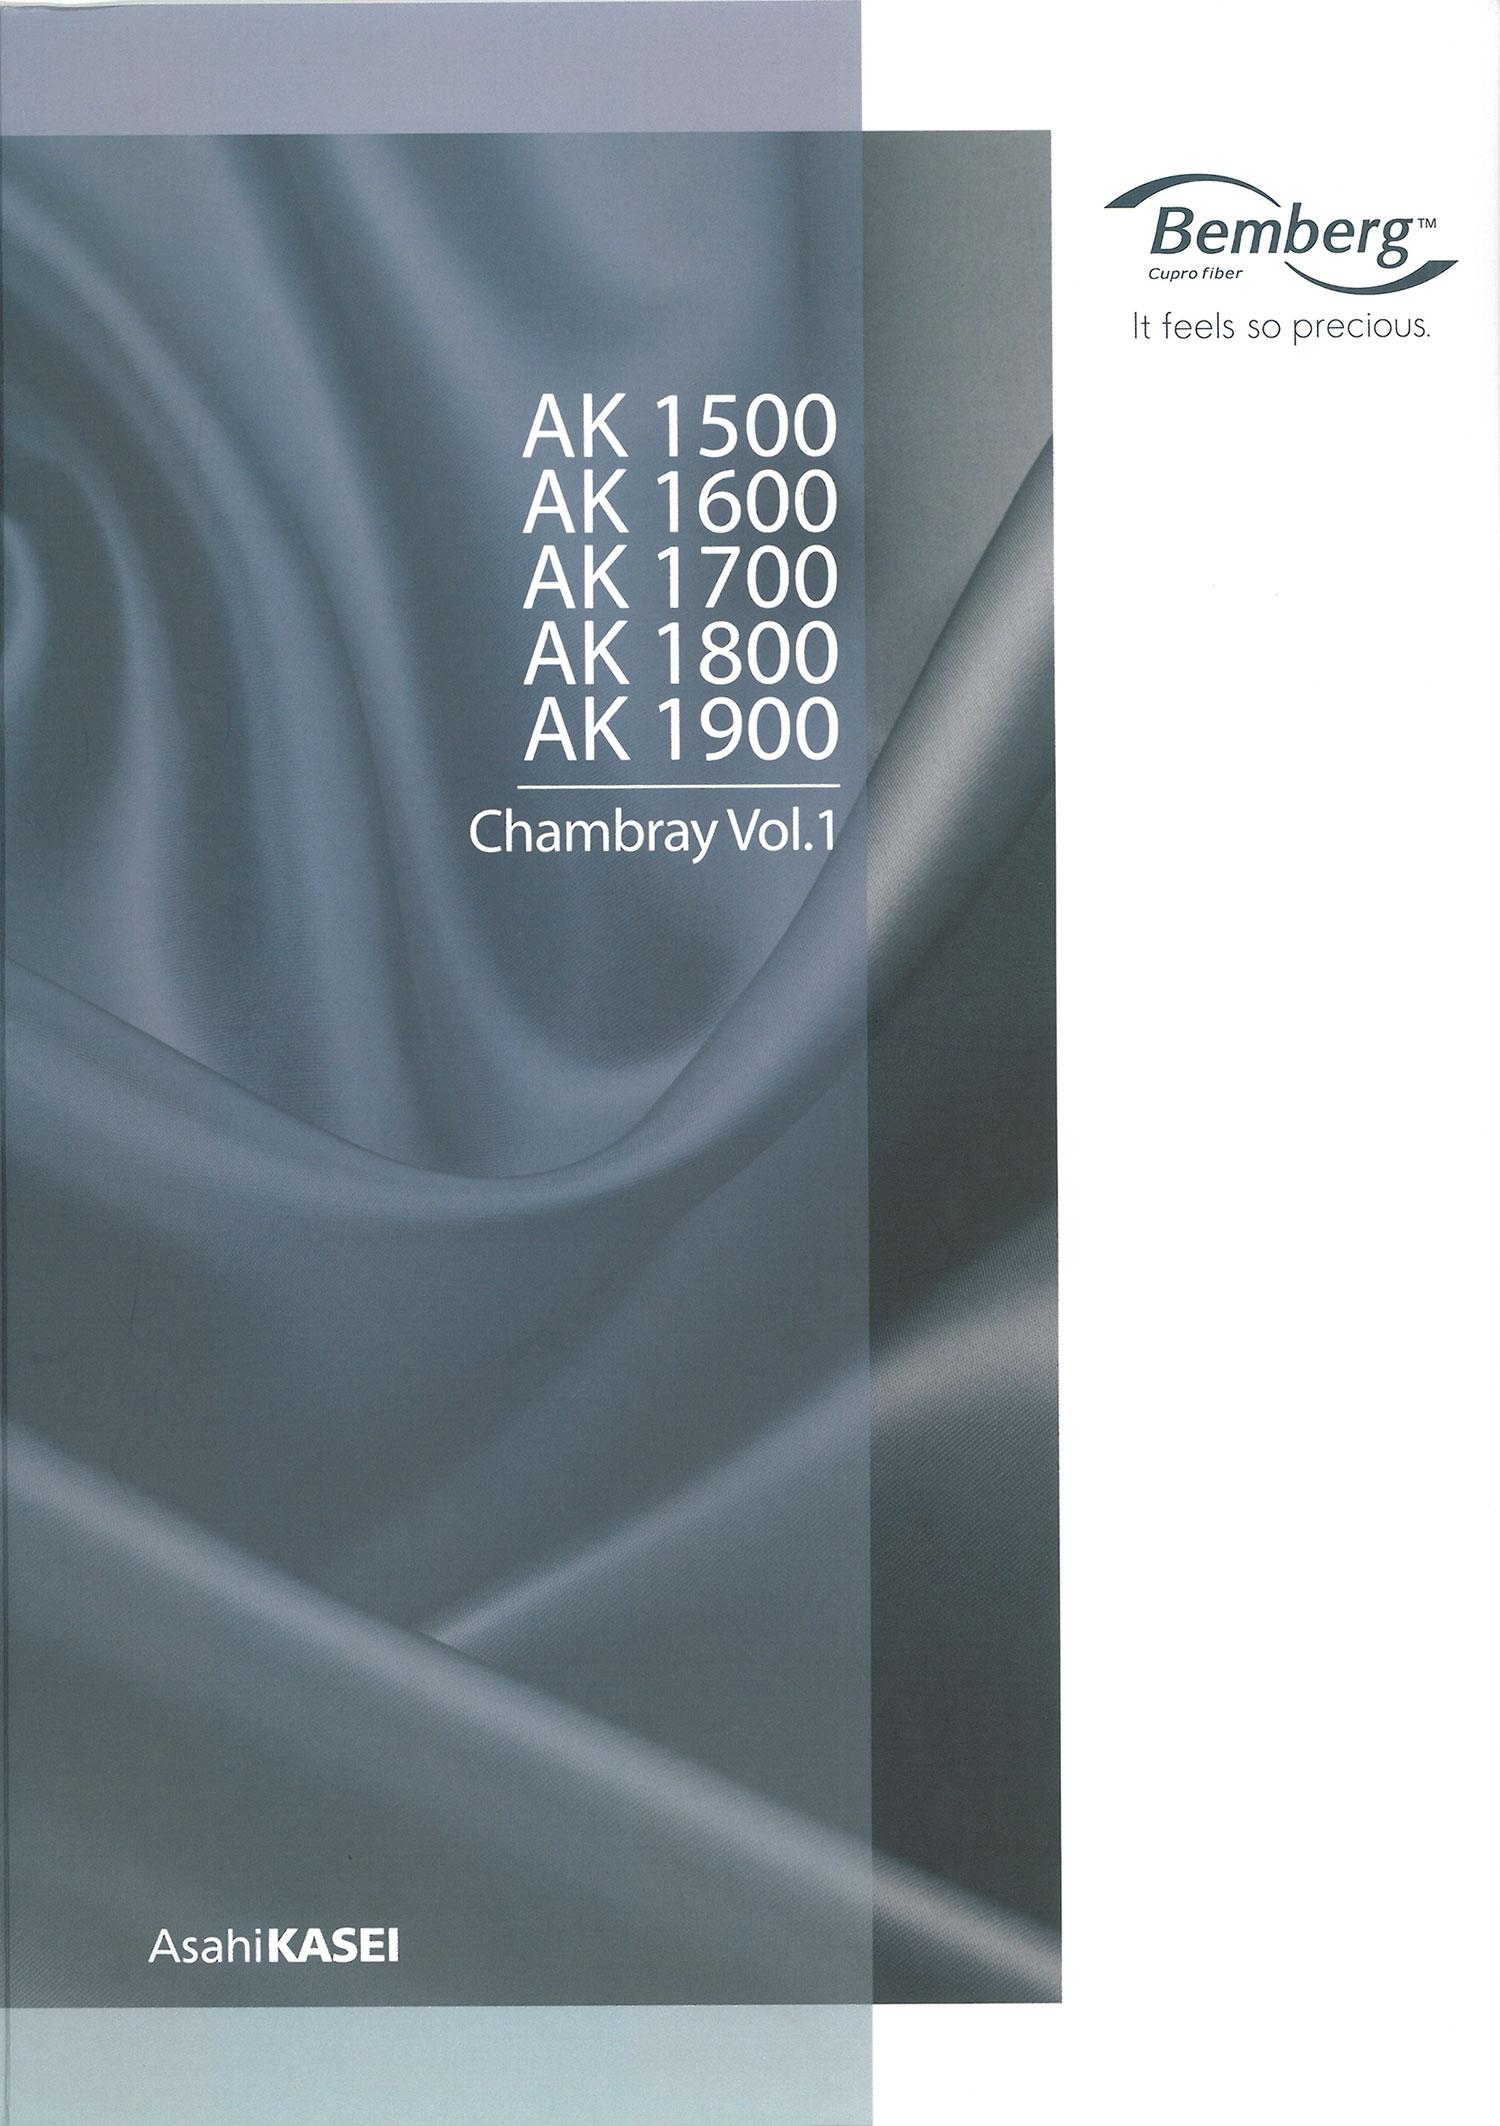 AK1500 キュプラタフタ裏地(ベンベルグ) 旭化成/オークラ商事 - ApparelX アパレル資材卸通販